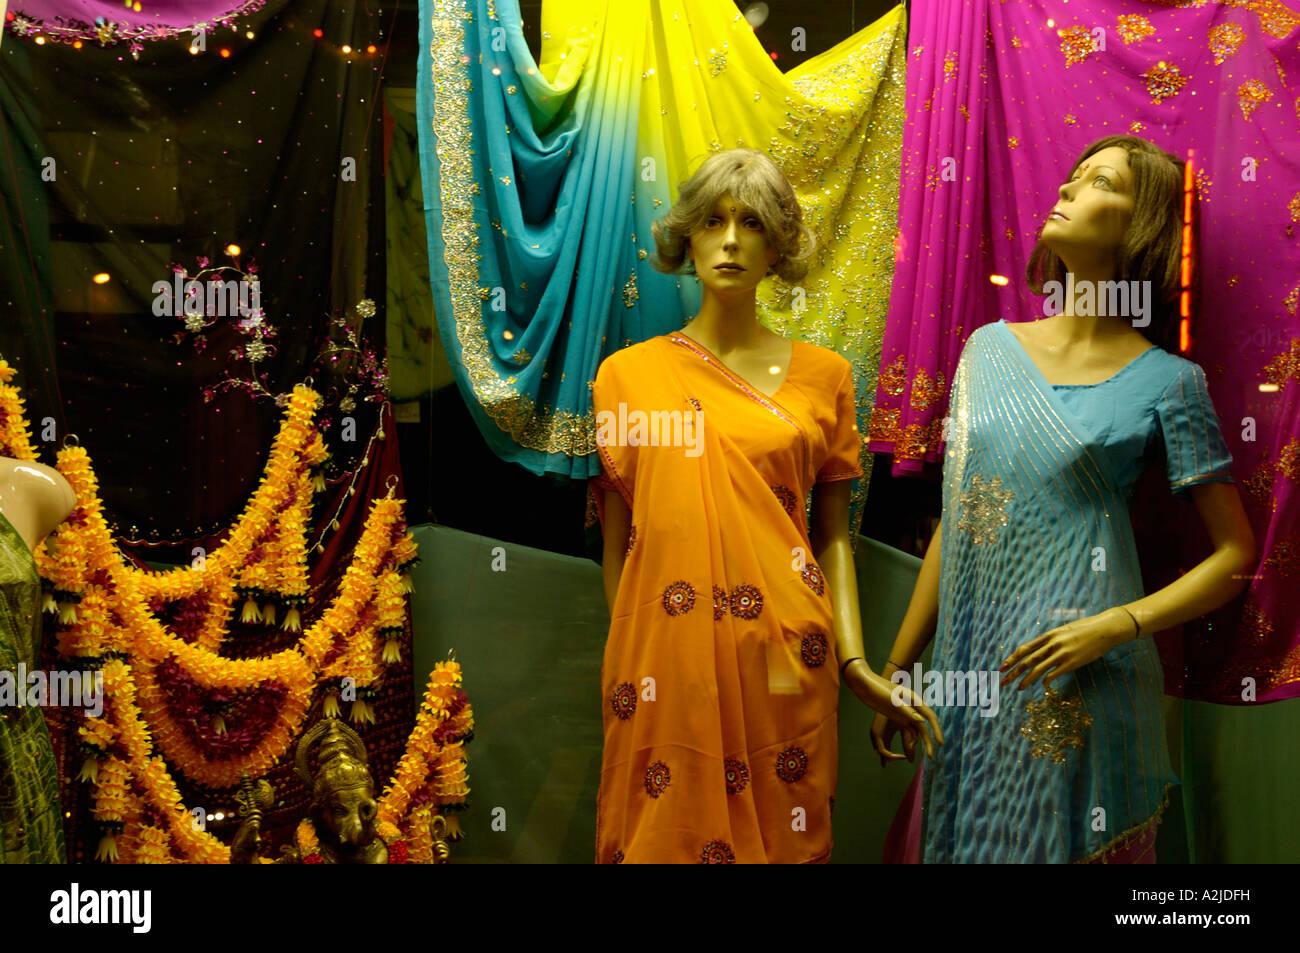 a9c36759afc Indian Clothes Shop Window Stock Photo  10535236 - Alamy